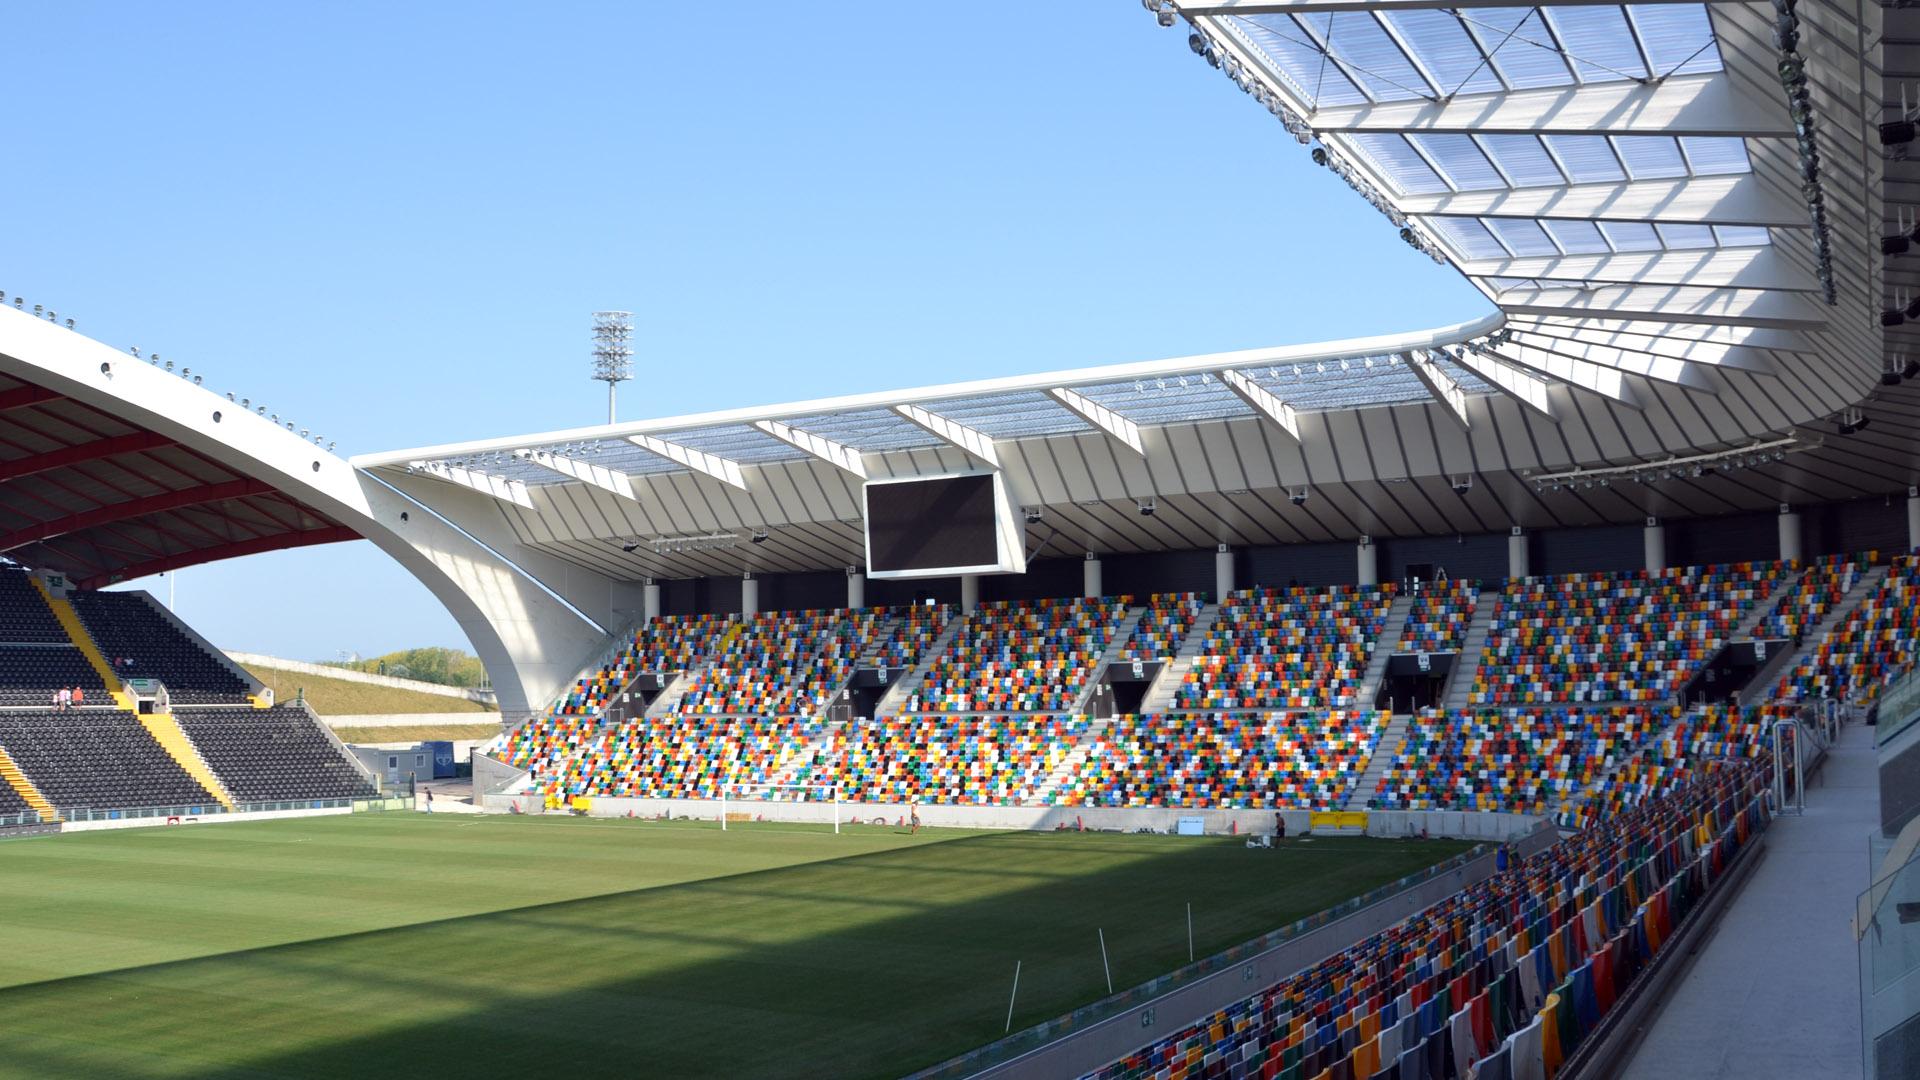 FOTO ANGOLO stadio-friuli